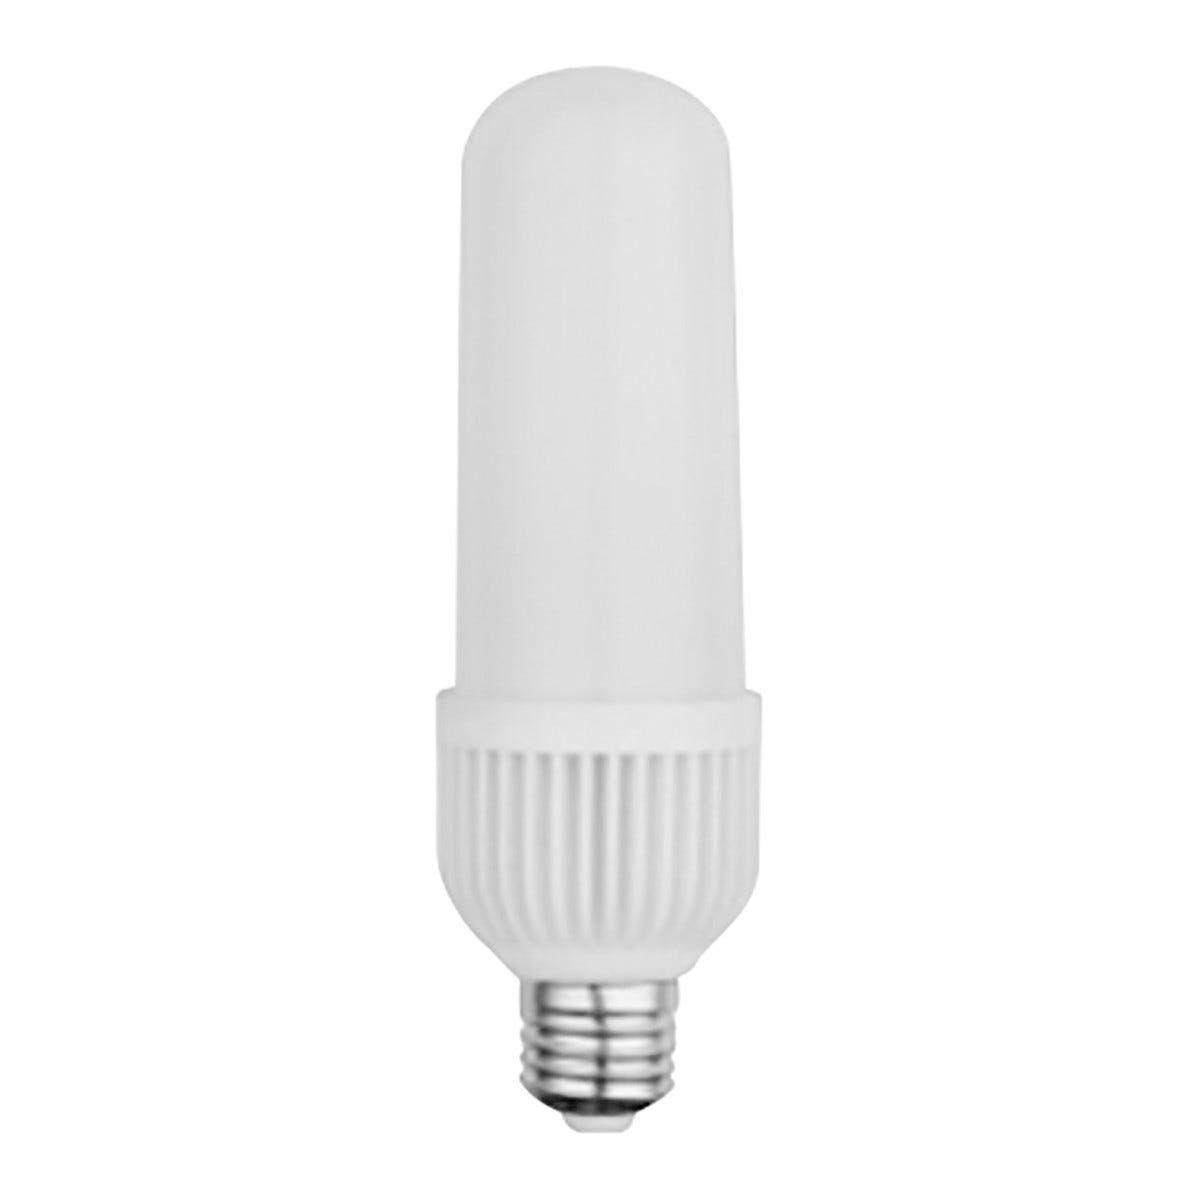 vivida international lampadina vivida led u-shape e27 11w=70w 980 lumen 6500k luce fredda dimensioni Ø43x160 mm